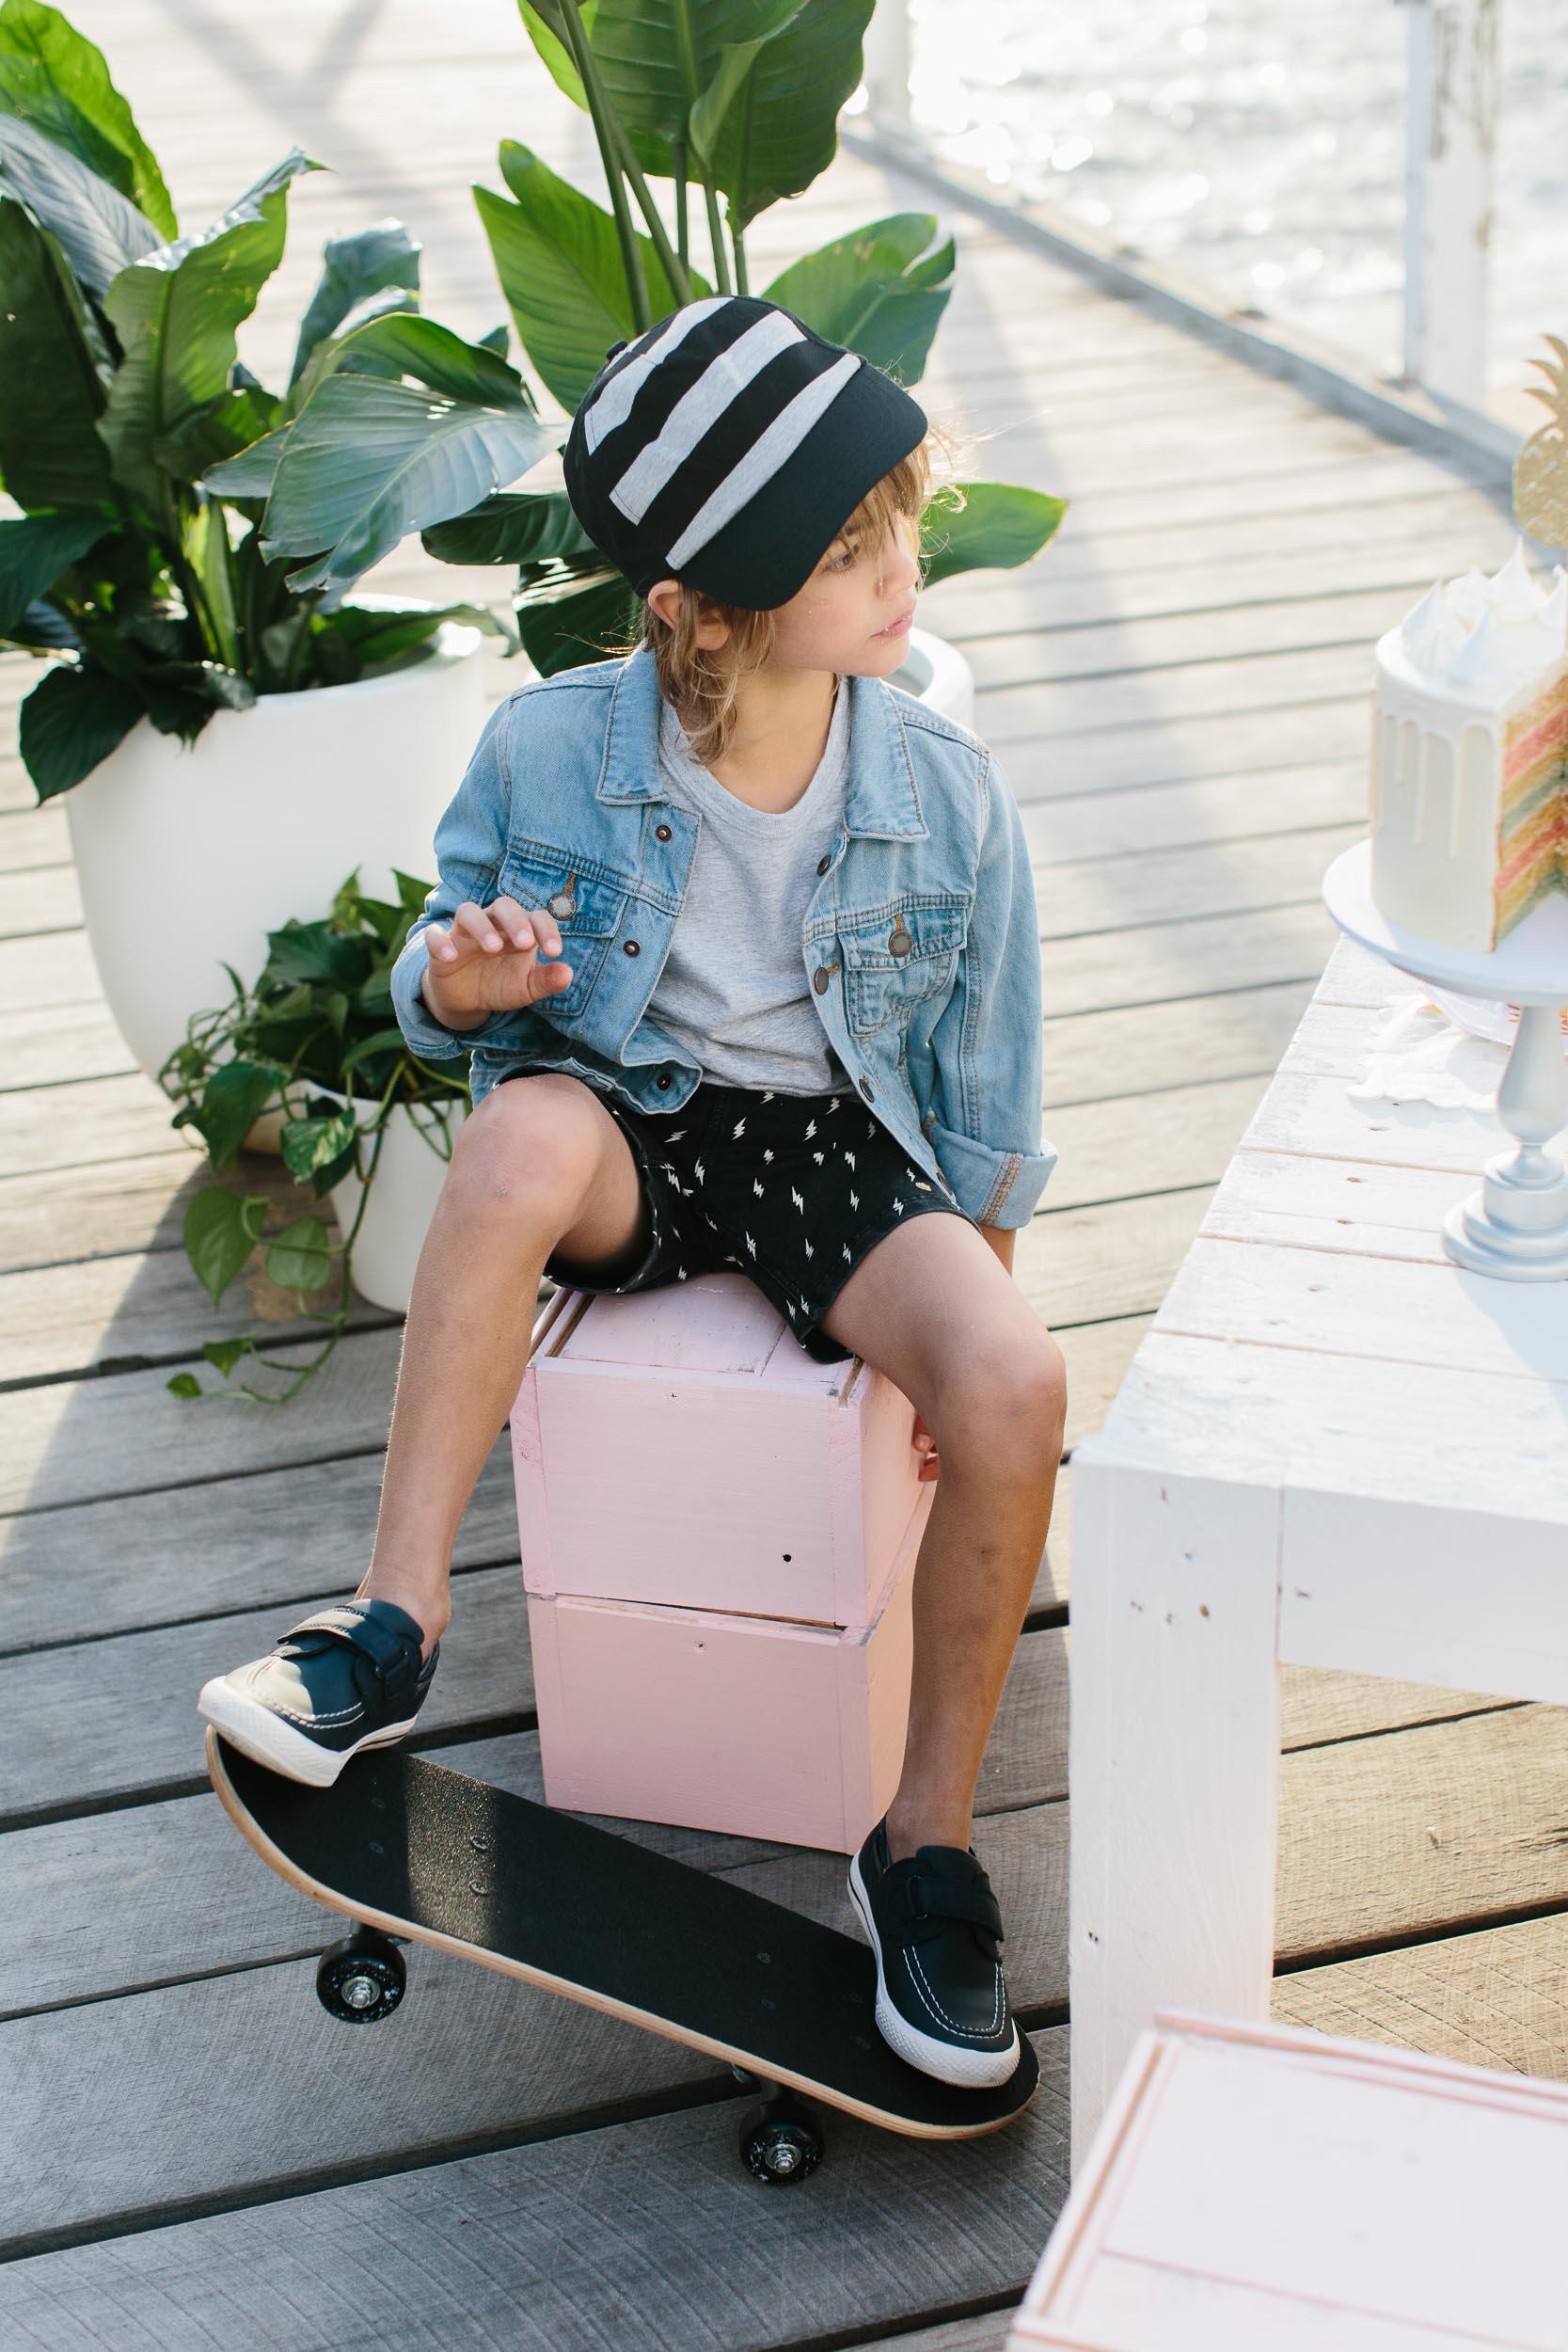 Kas-Richards-LENZO_Betts-Kids-Shoes-365.jpg